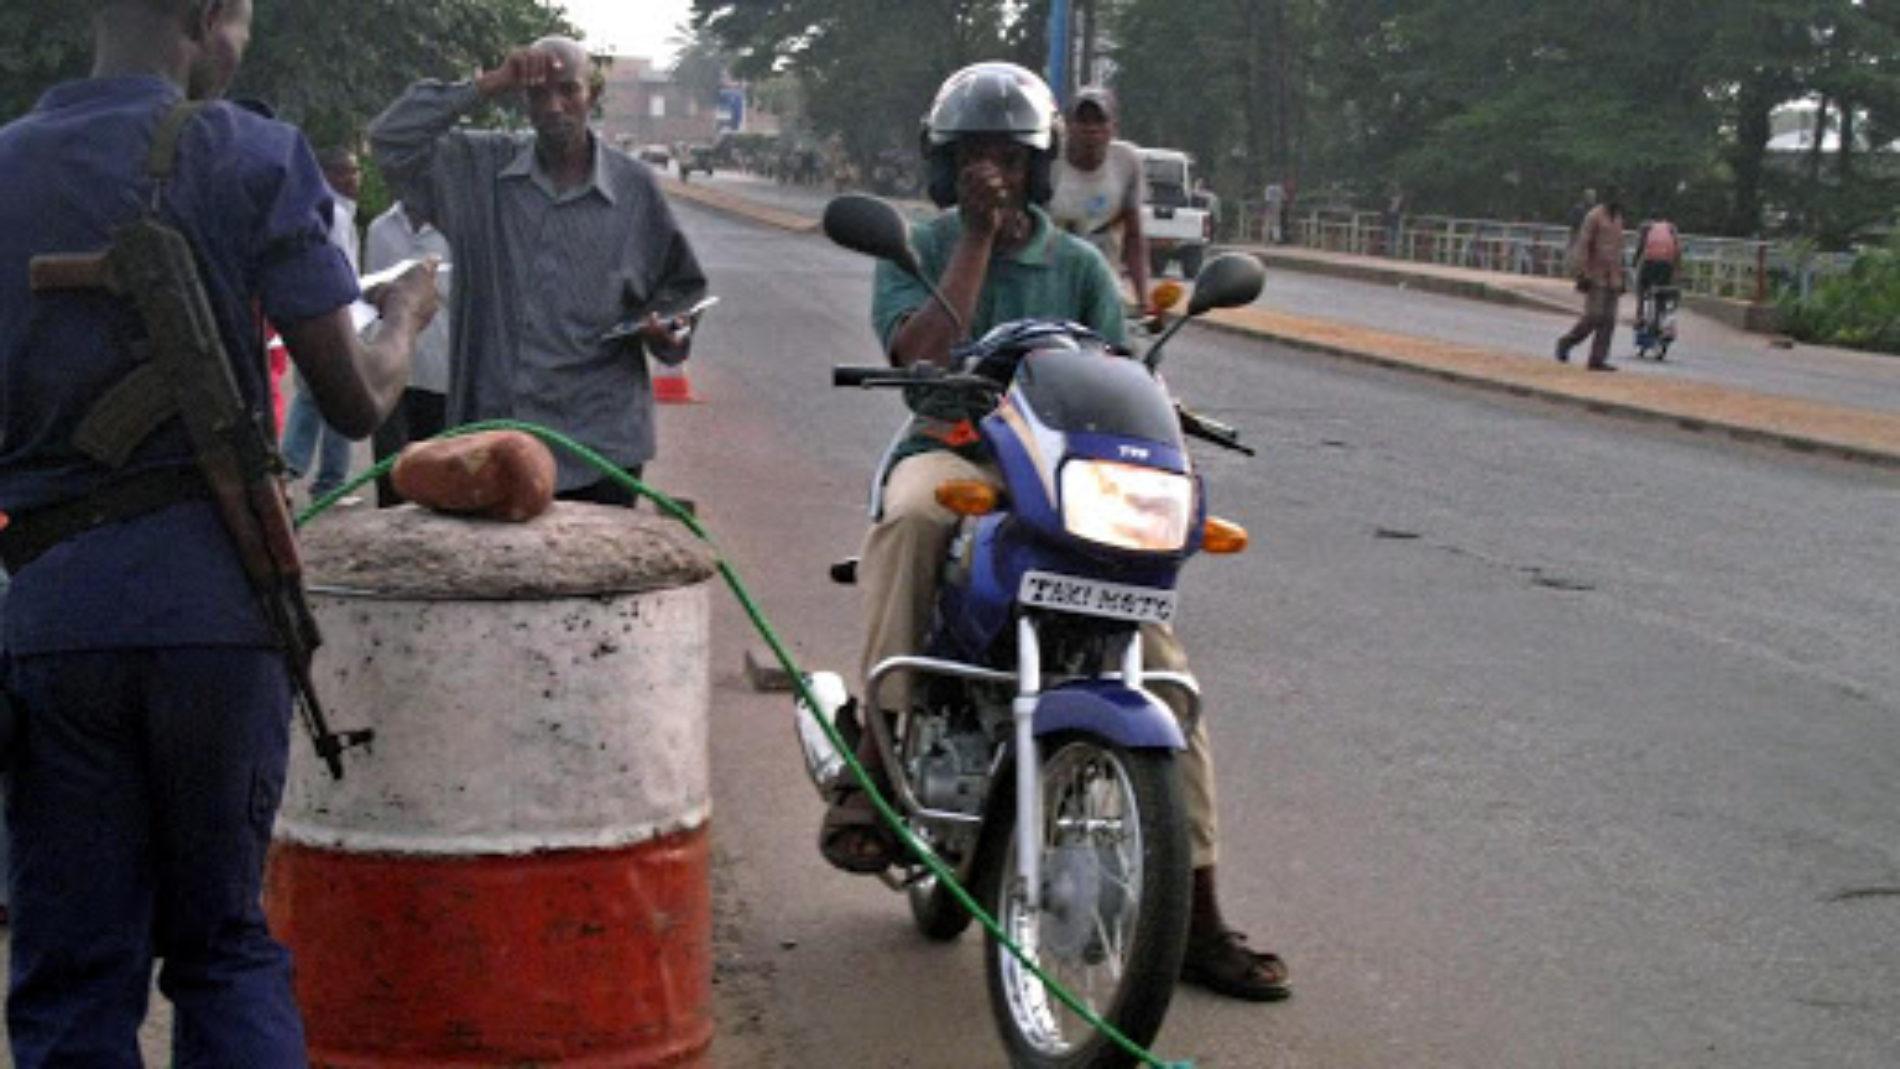 Makamba : un policier menace de mort des motards